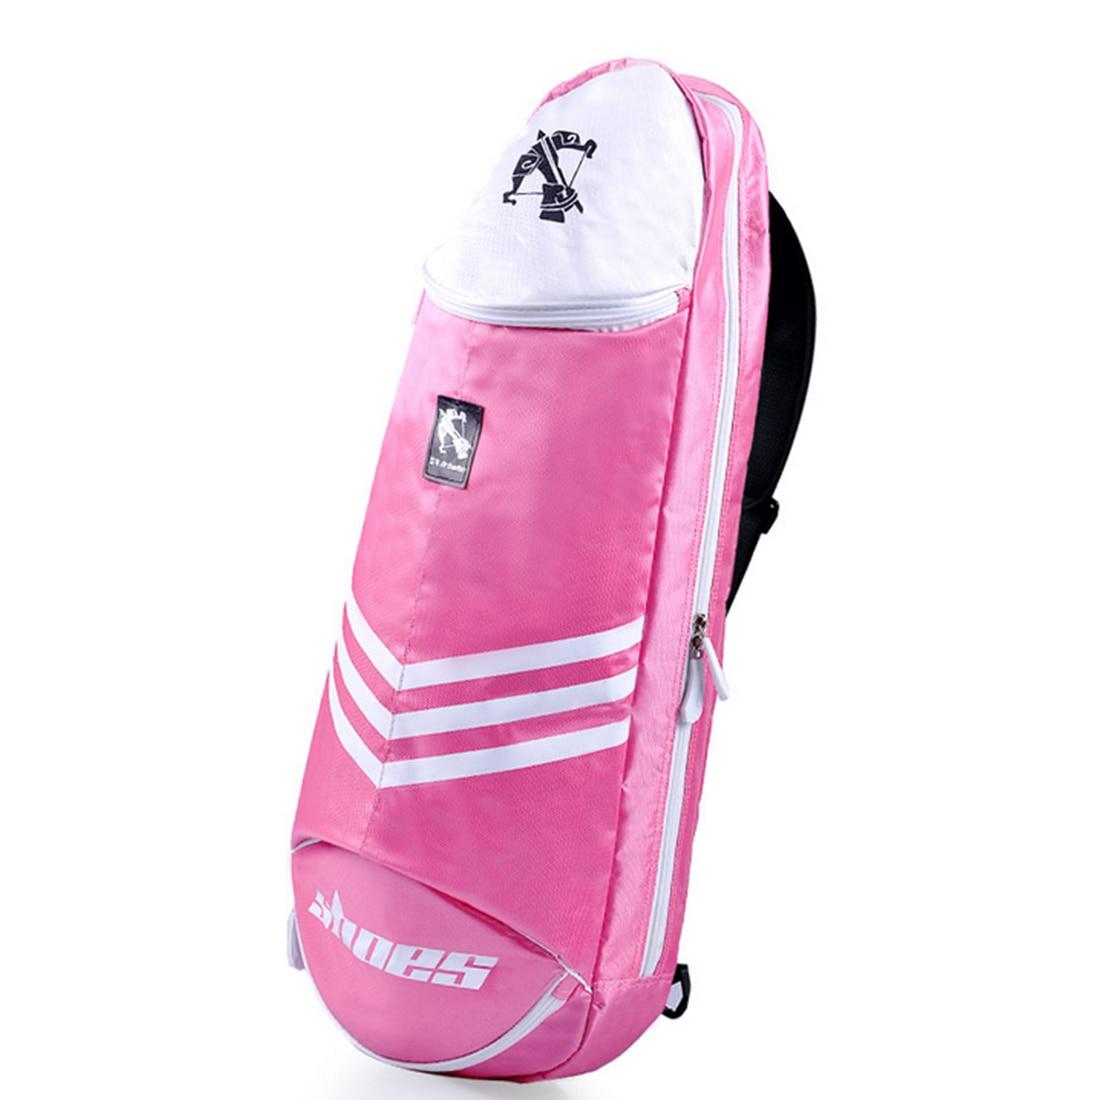 Big Racquet Sports Bag Badminton Bag Crossbow Waterproof Multi layer Placement Tennis Racket Dacron Shoulder Bag